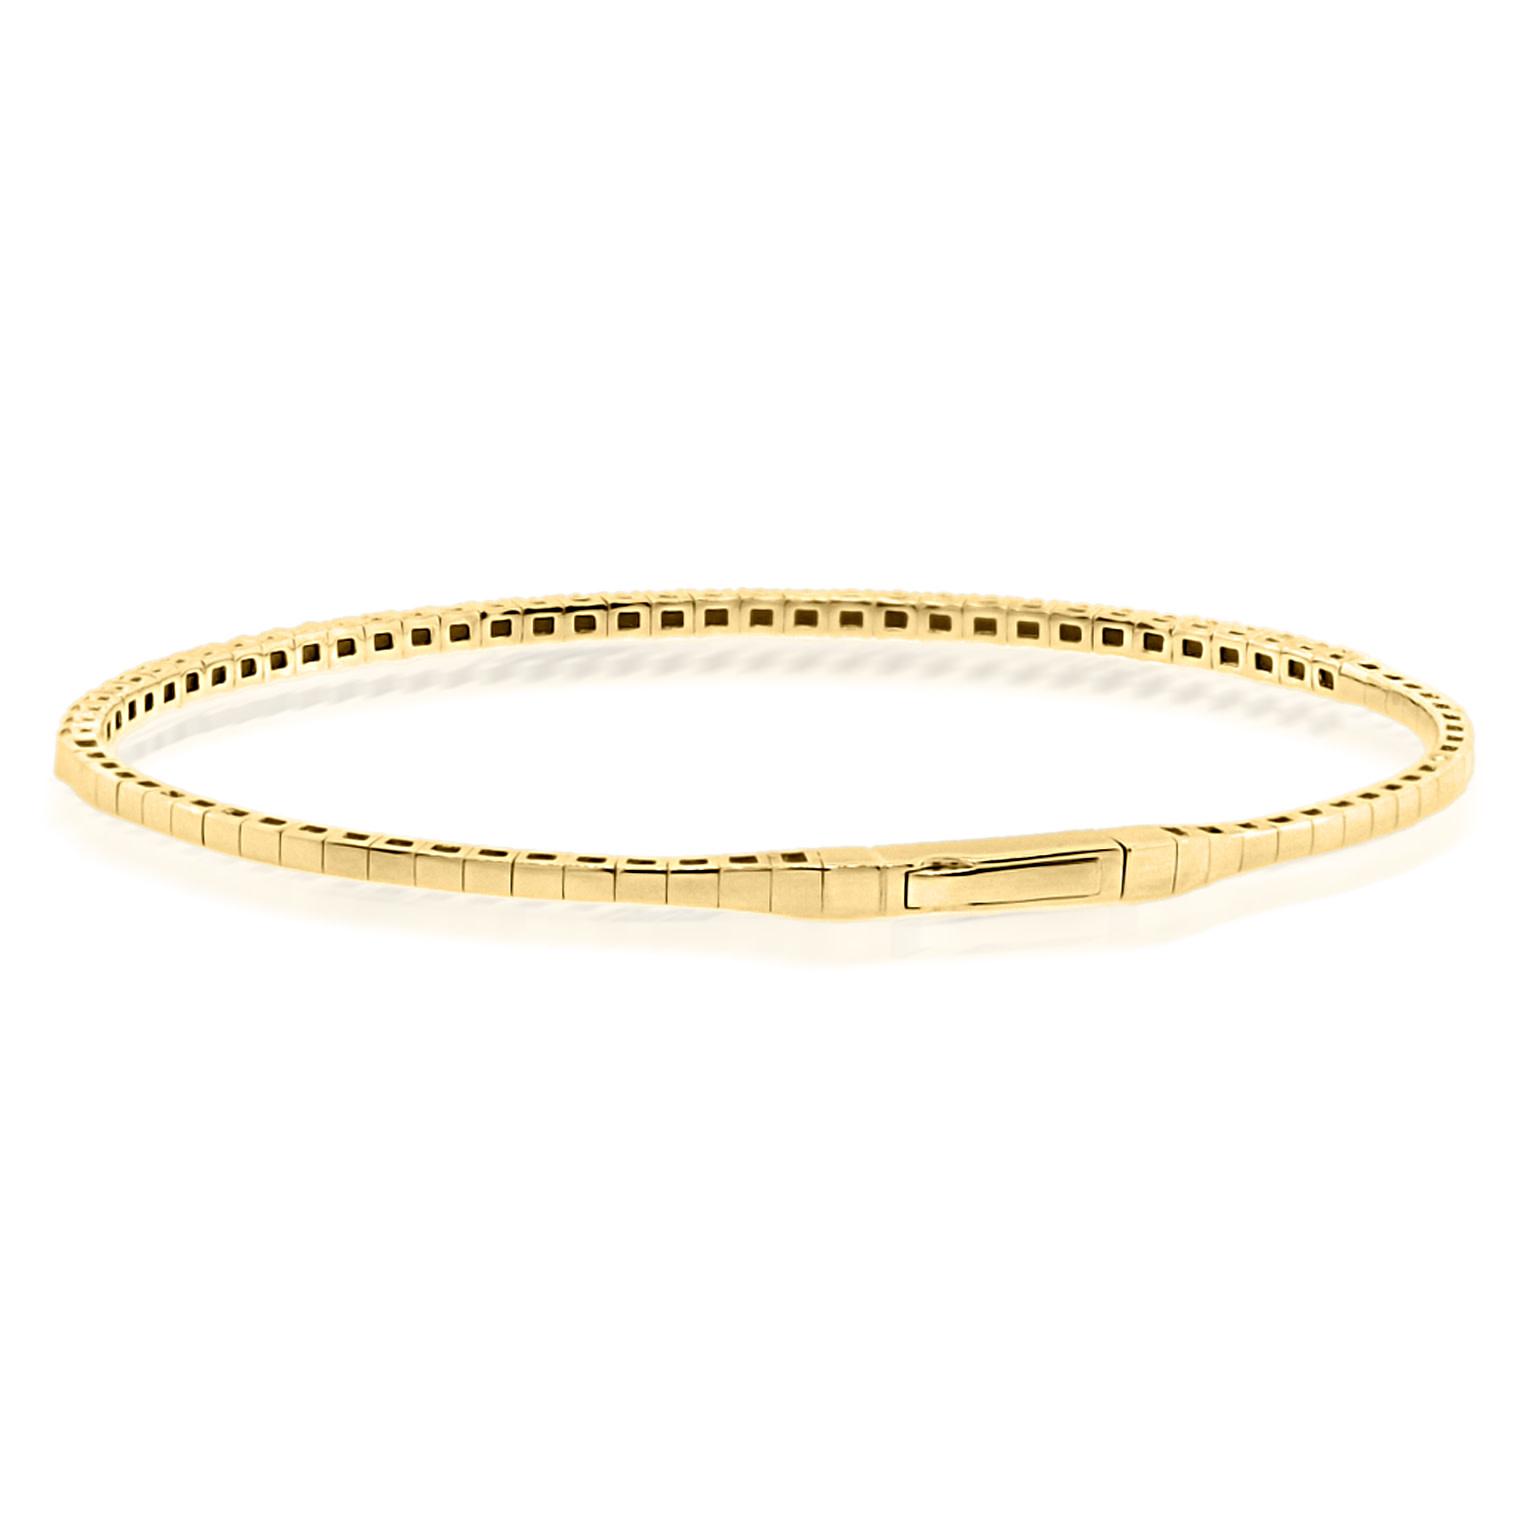 Trabert Goldsmiths 1ct Yellow Gold Diamond Flex Bracelet